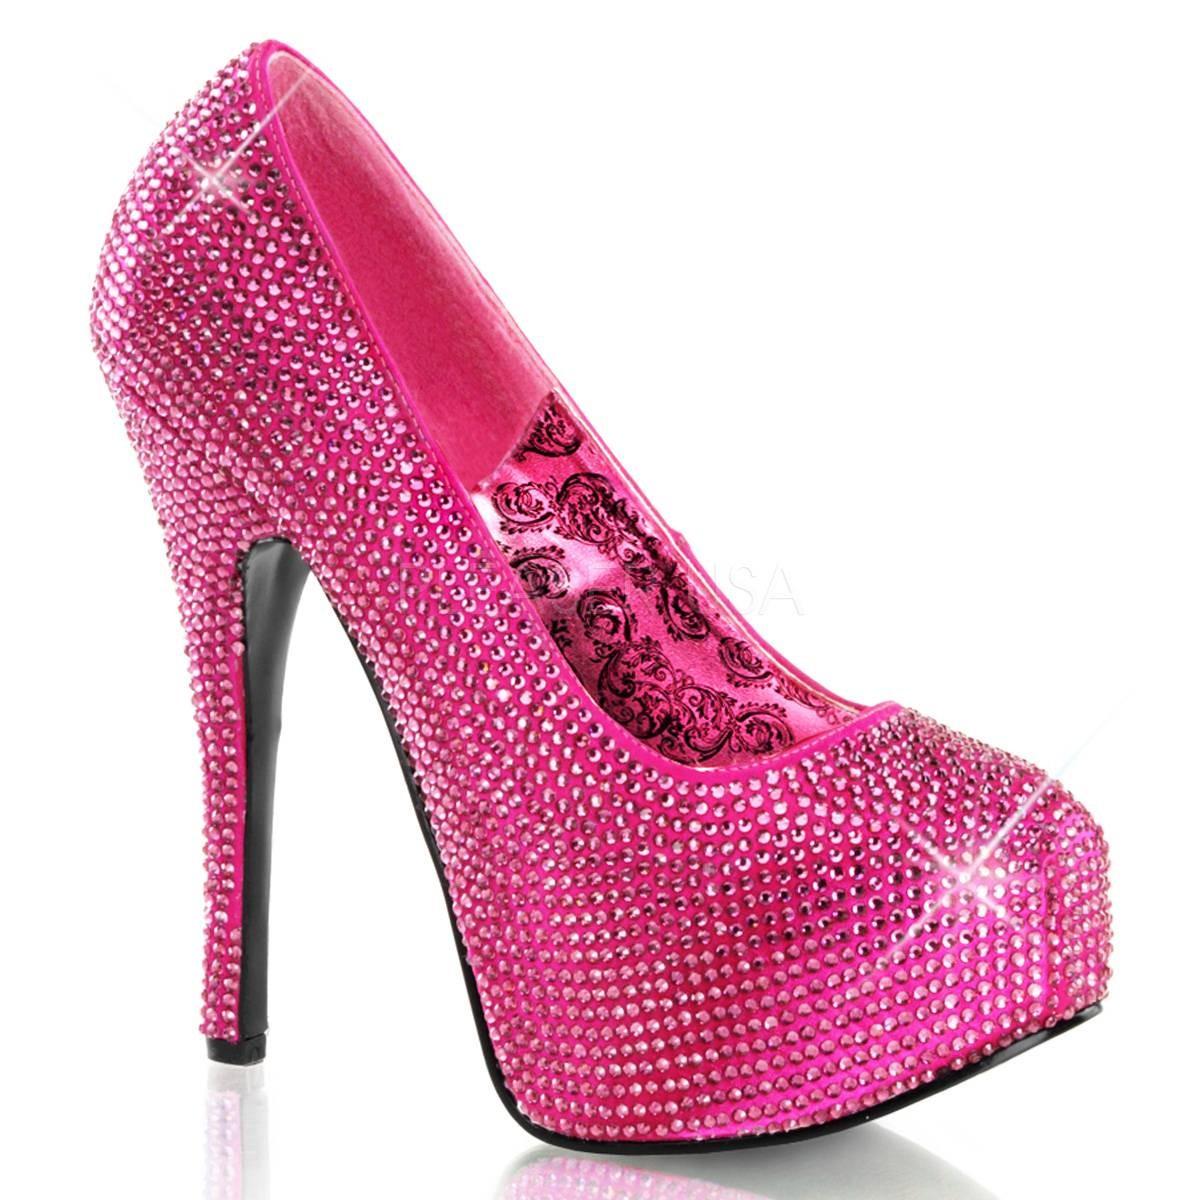 Highheels - TEEZE 06R ° Damen Pumps ° Pink Satin ° Bordello  - Onlineshop RedSixty